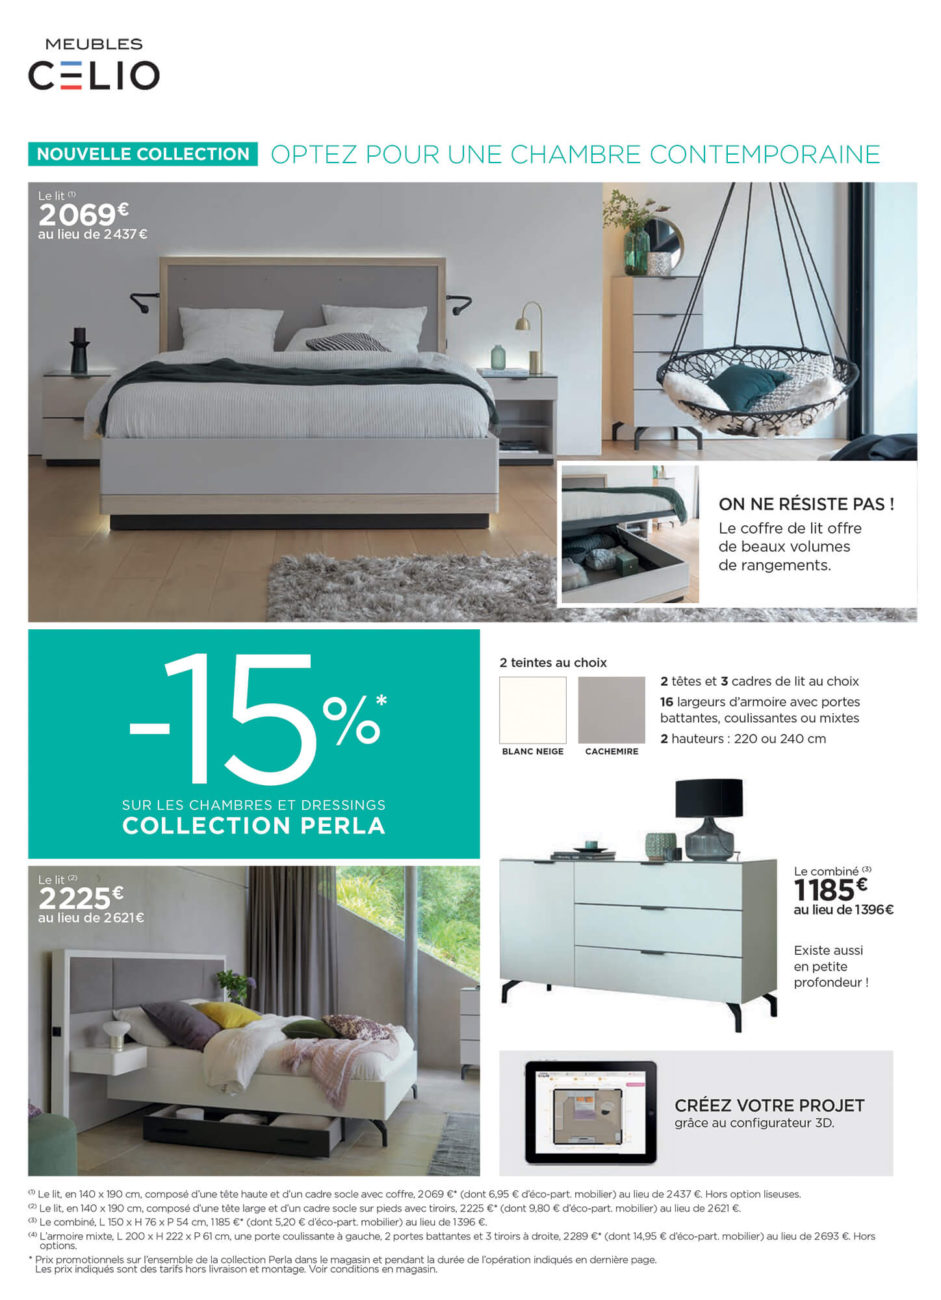 meuble-celio-promotion-mars-2019-vazard-home-p2